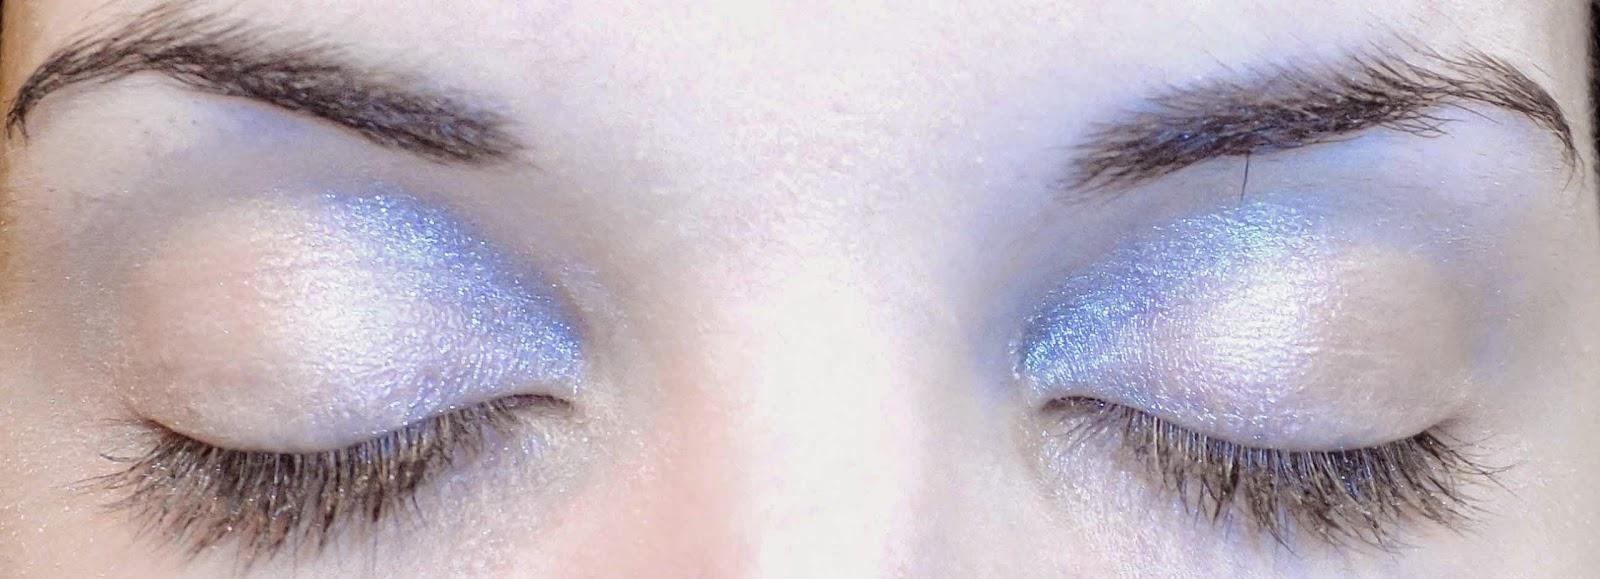 maquillaje para agrandar ojos paso a paso 1